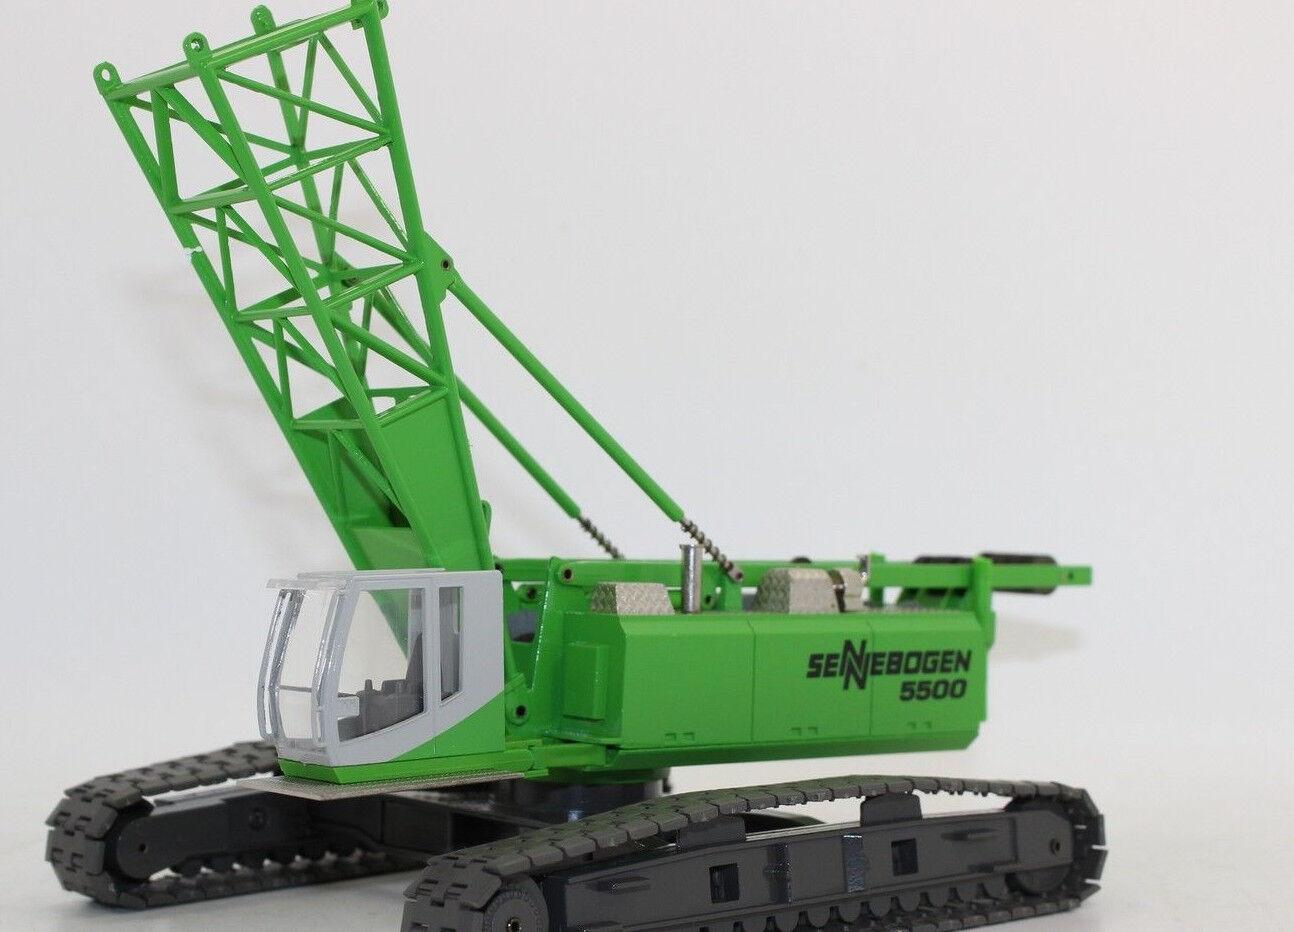 Conrad 2733 02 Sennebogen Starlifter 5500 Crawler Crane 1 50 Nip